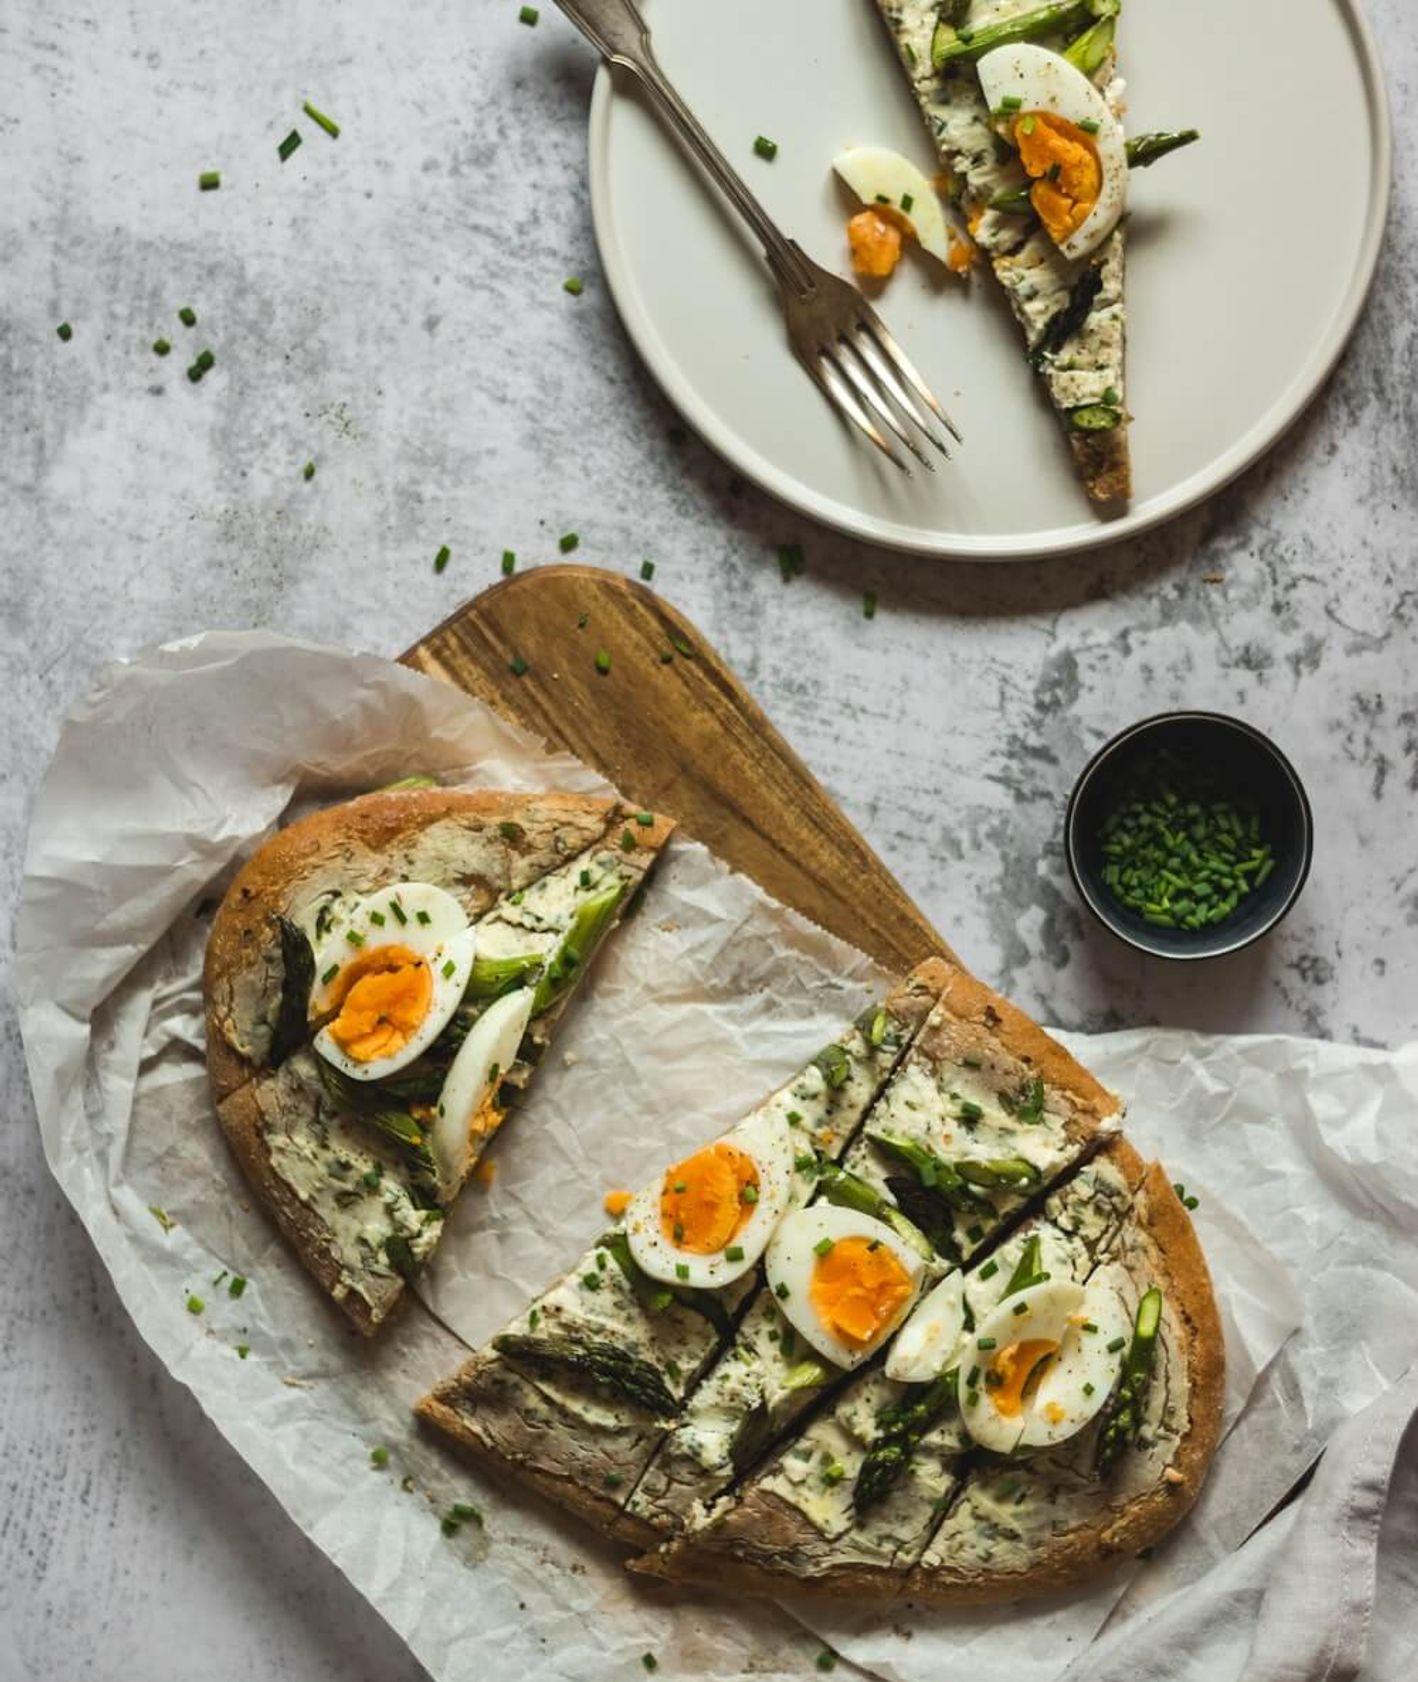 zapiekanka z chleba - sposób na niemarnowanie chleba (fot. Svitlana Denysiuk)